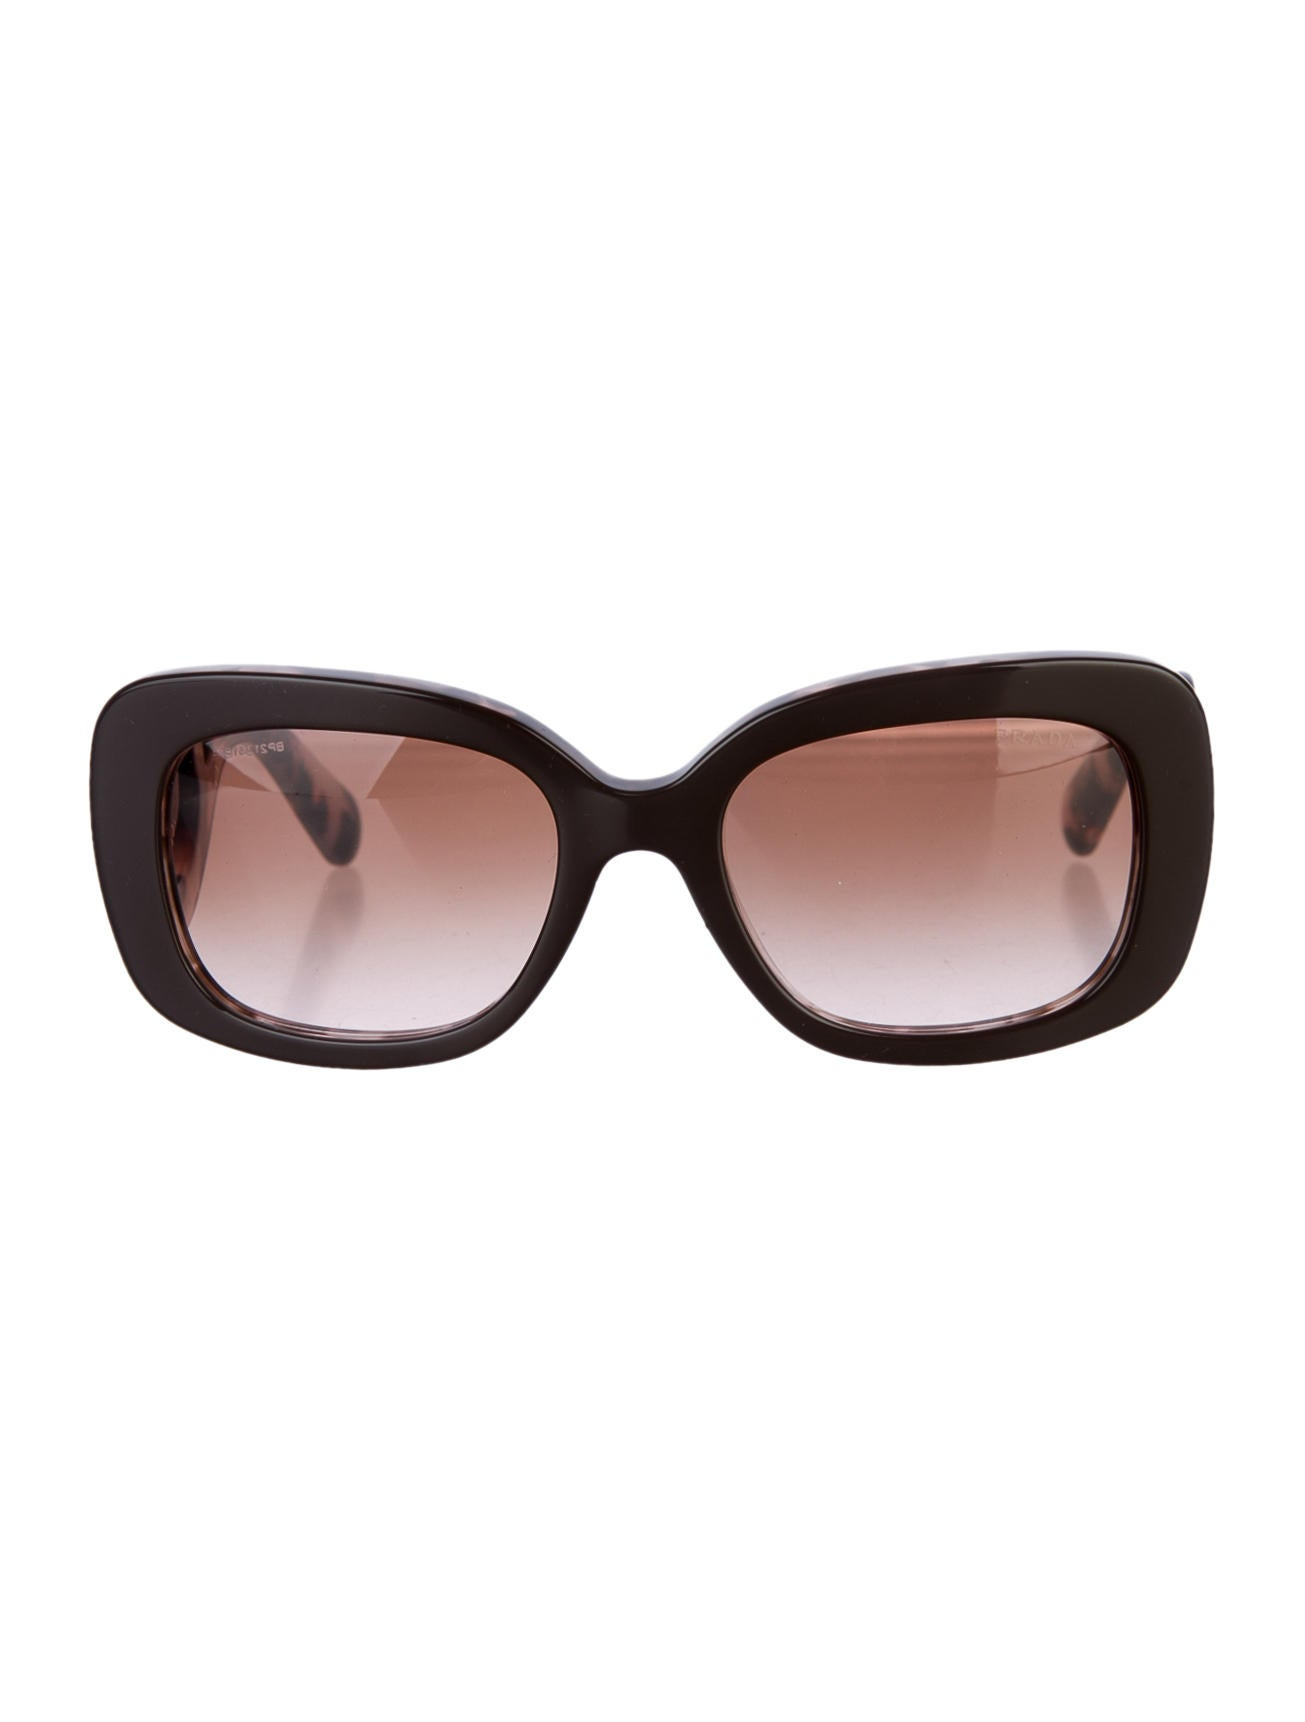 prada baroque sunglasses accessories pra48269 the